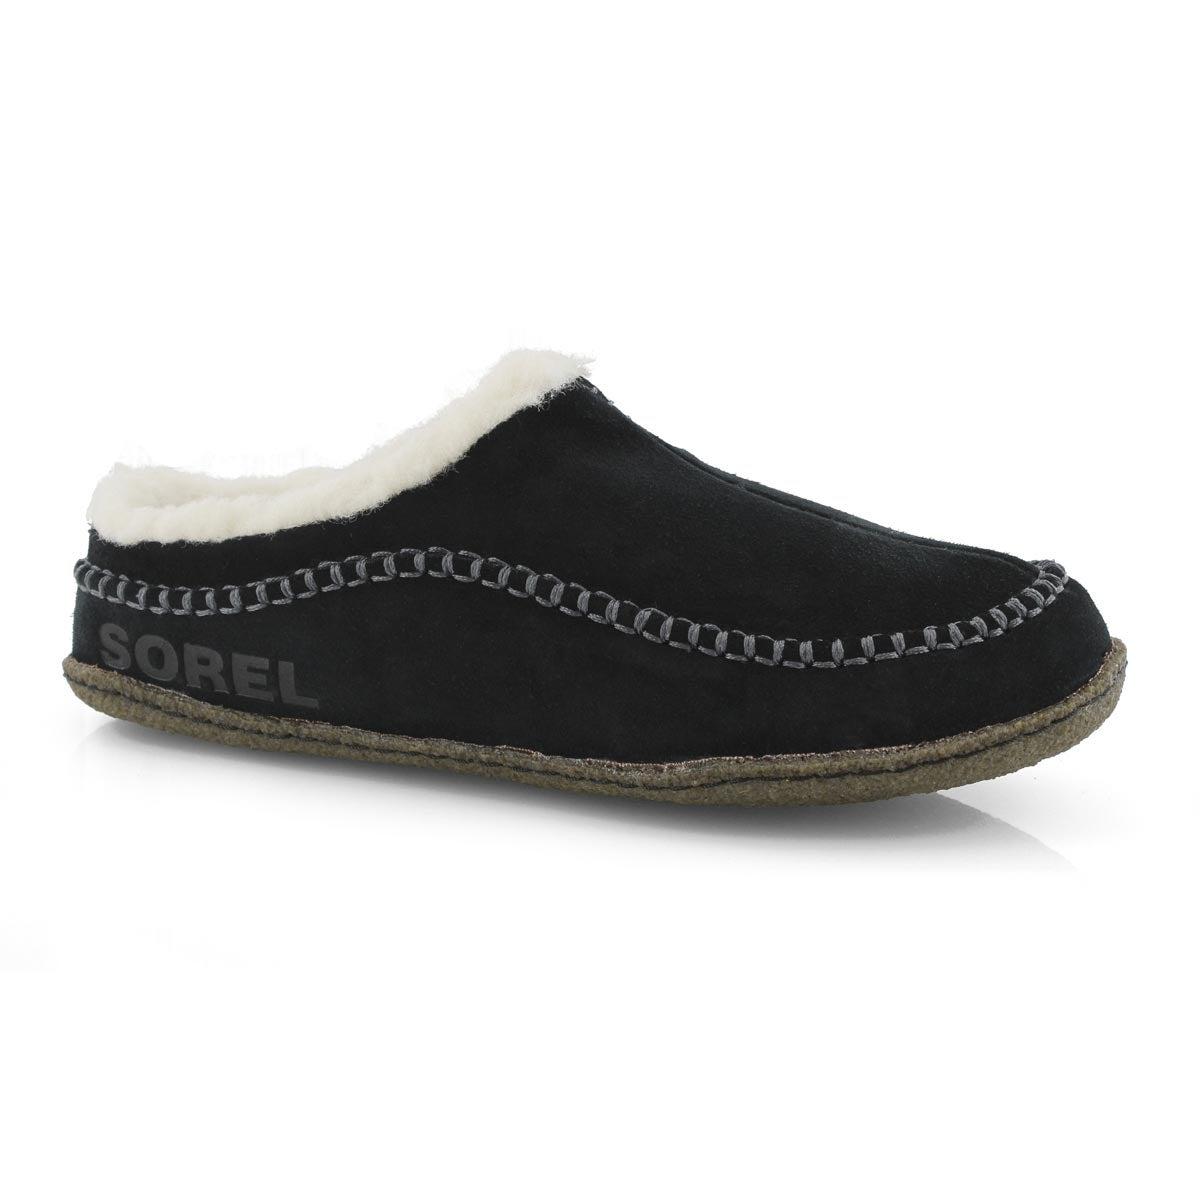 Mns Falcon Ridge II blk/dk stone slipper